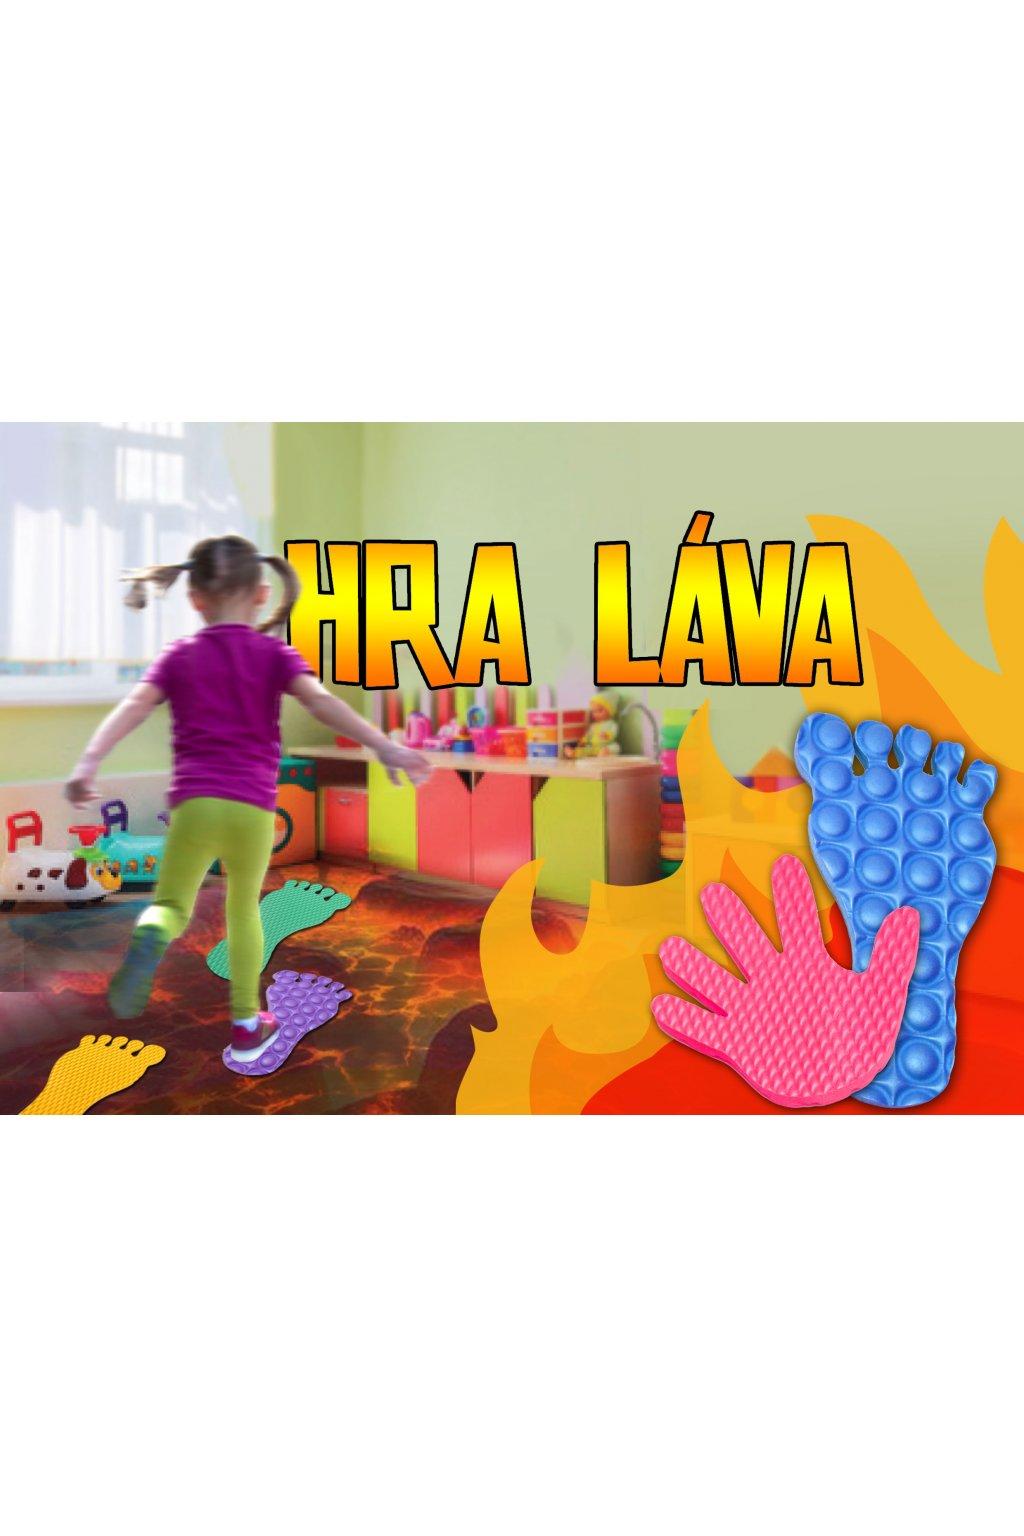 Hra láva- set ruce a nohy